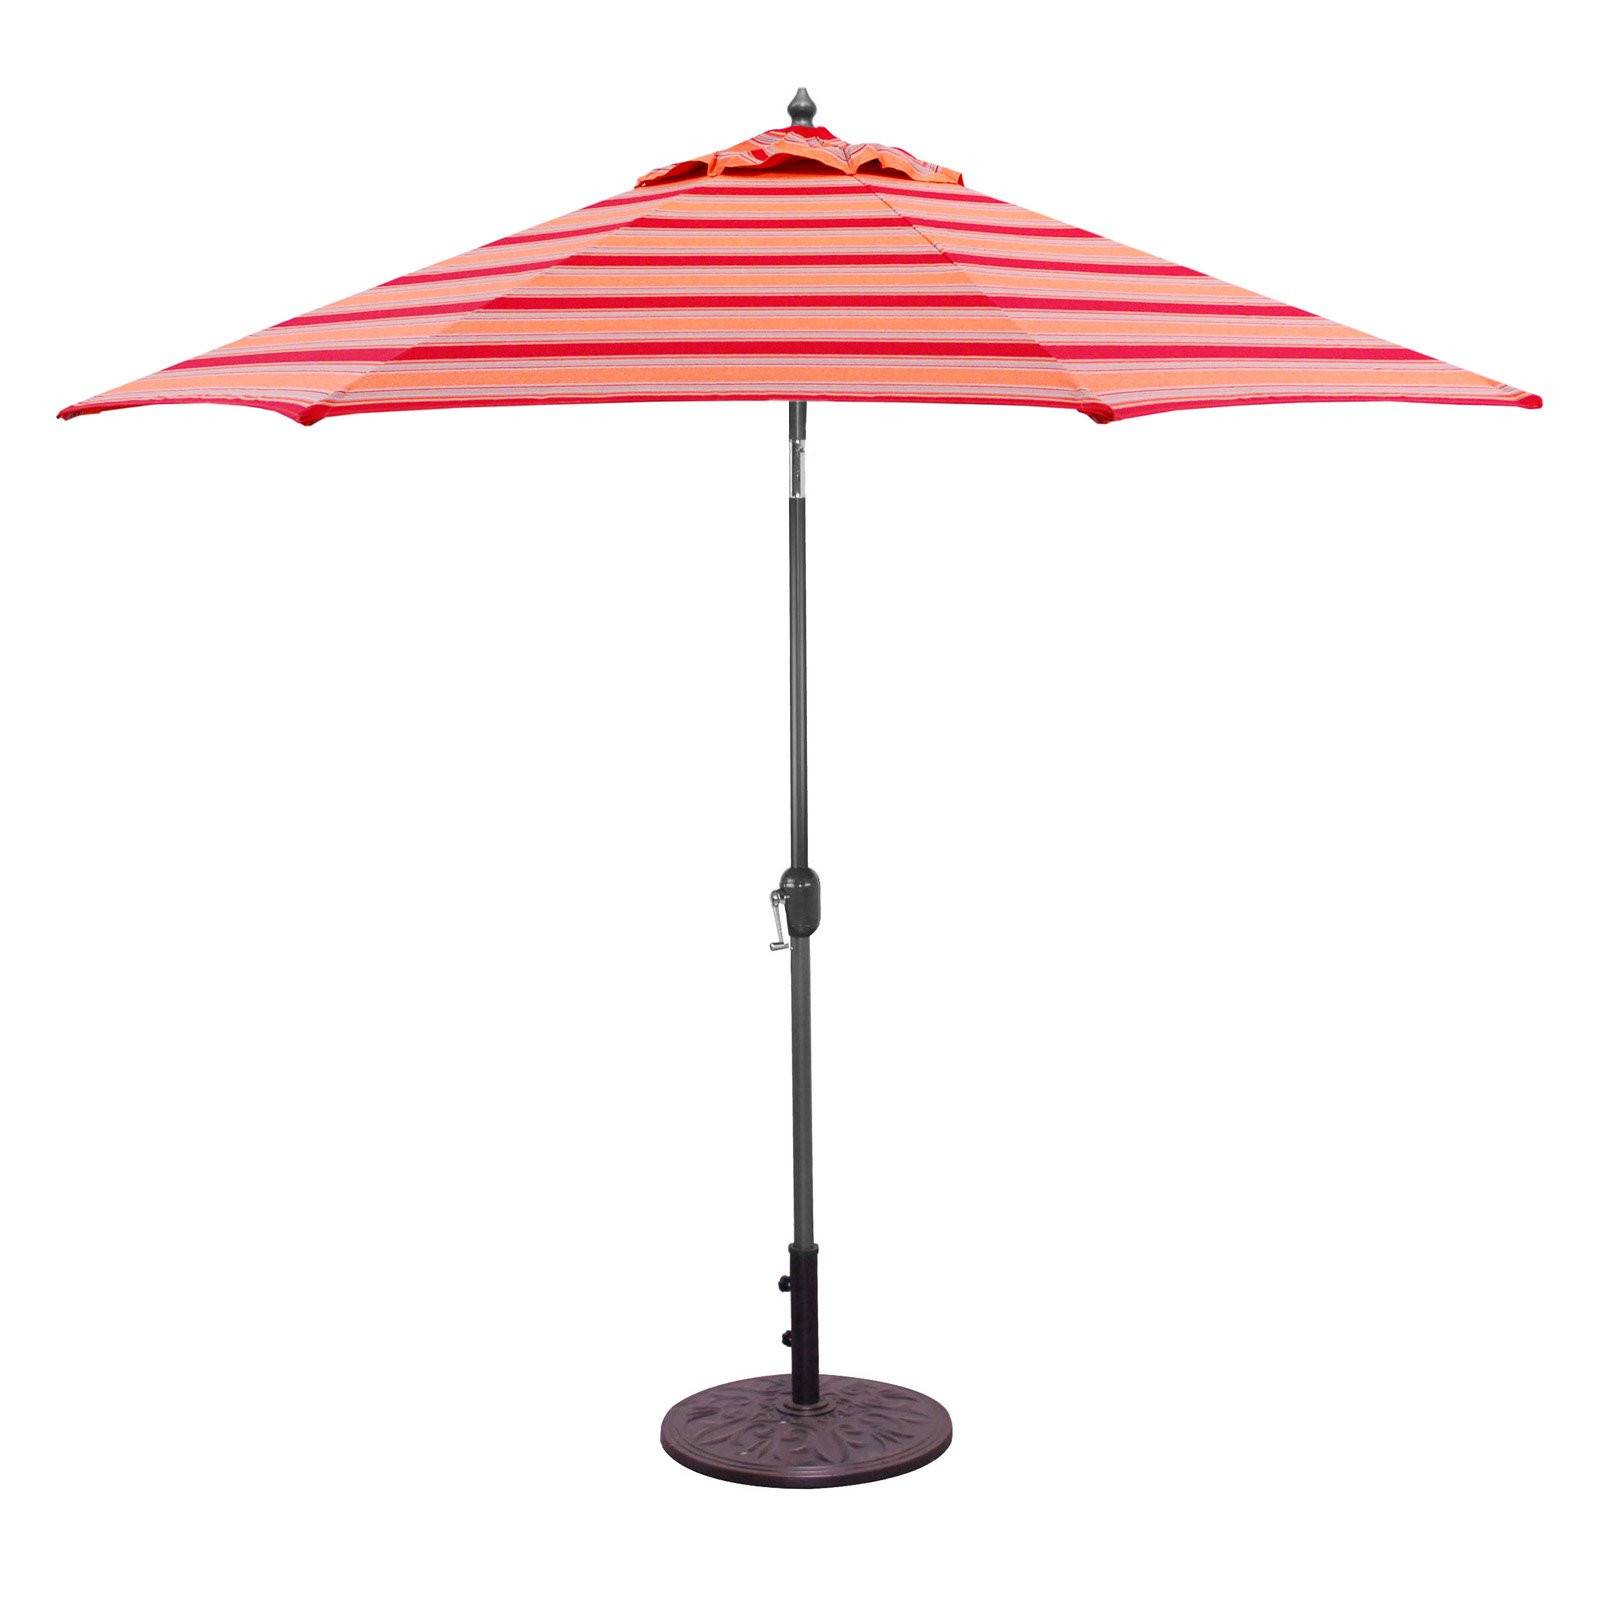 Best ideas about Sunbrella Patio Umbrellas . Save or Pin Galtech 9 ft Sunbrella Aluminum Patio Umbrella Walmart Now.